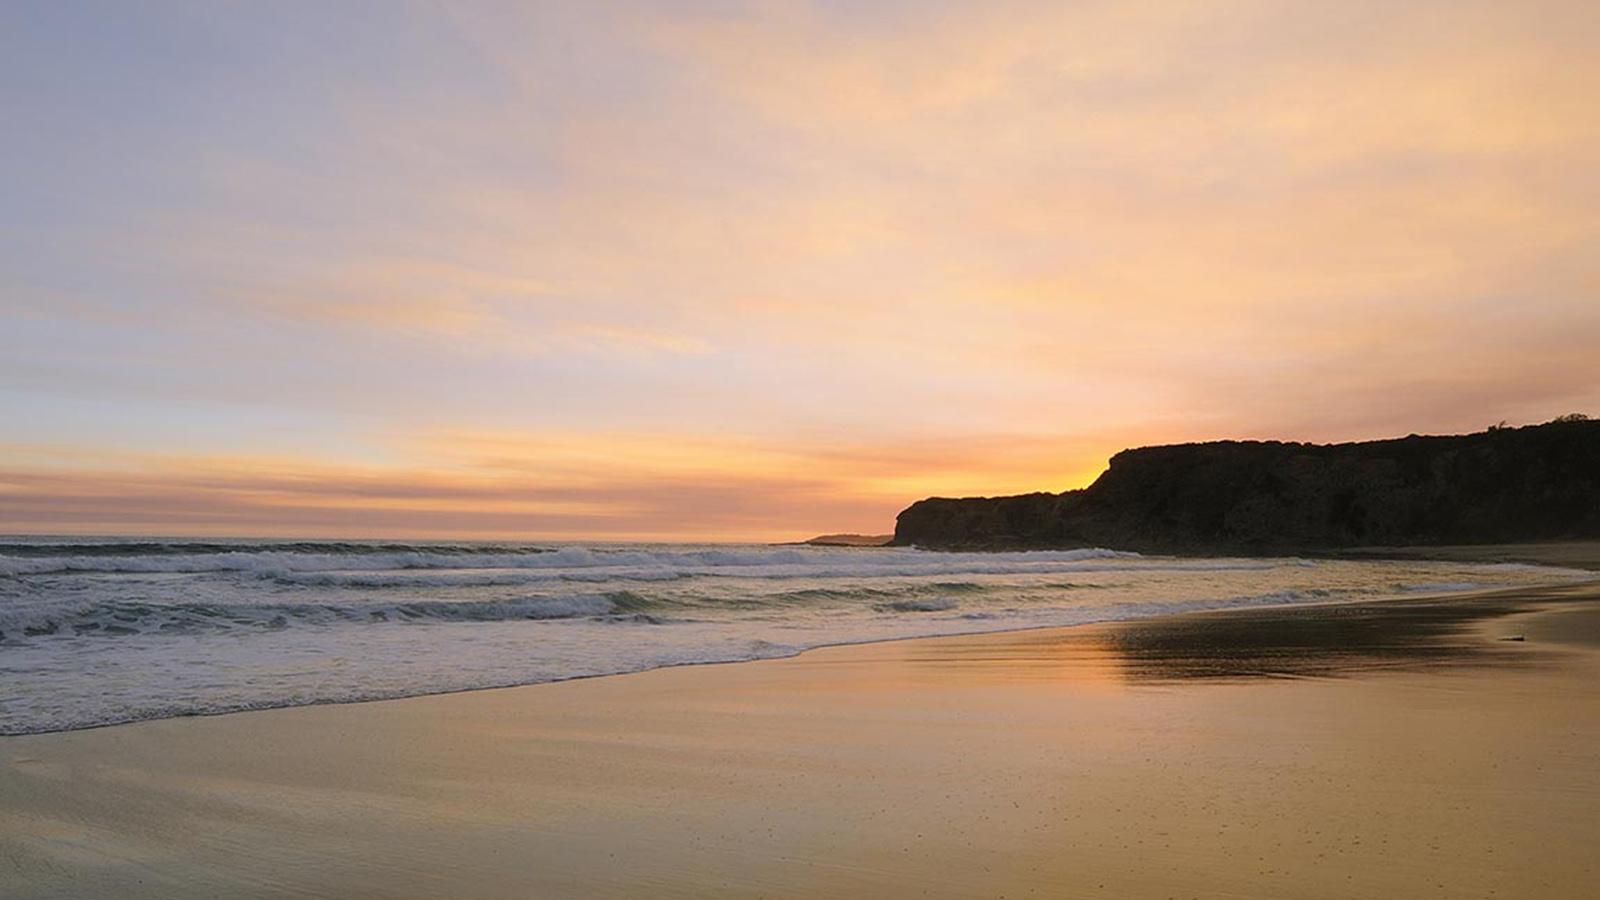 Inverloch Beach, Gippsland, Victoria, Australia